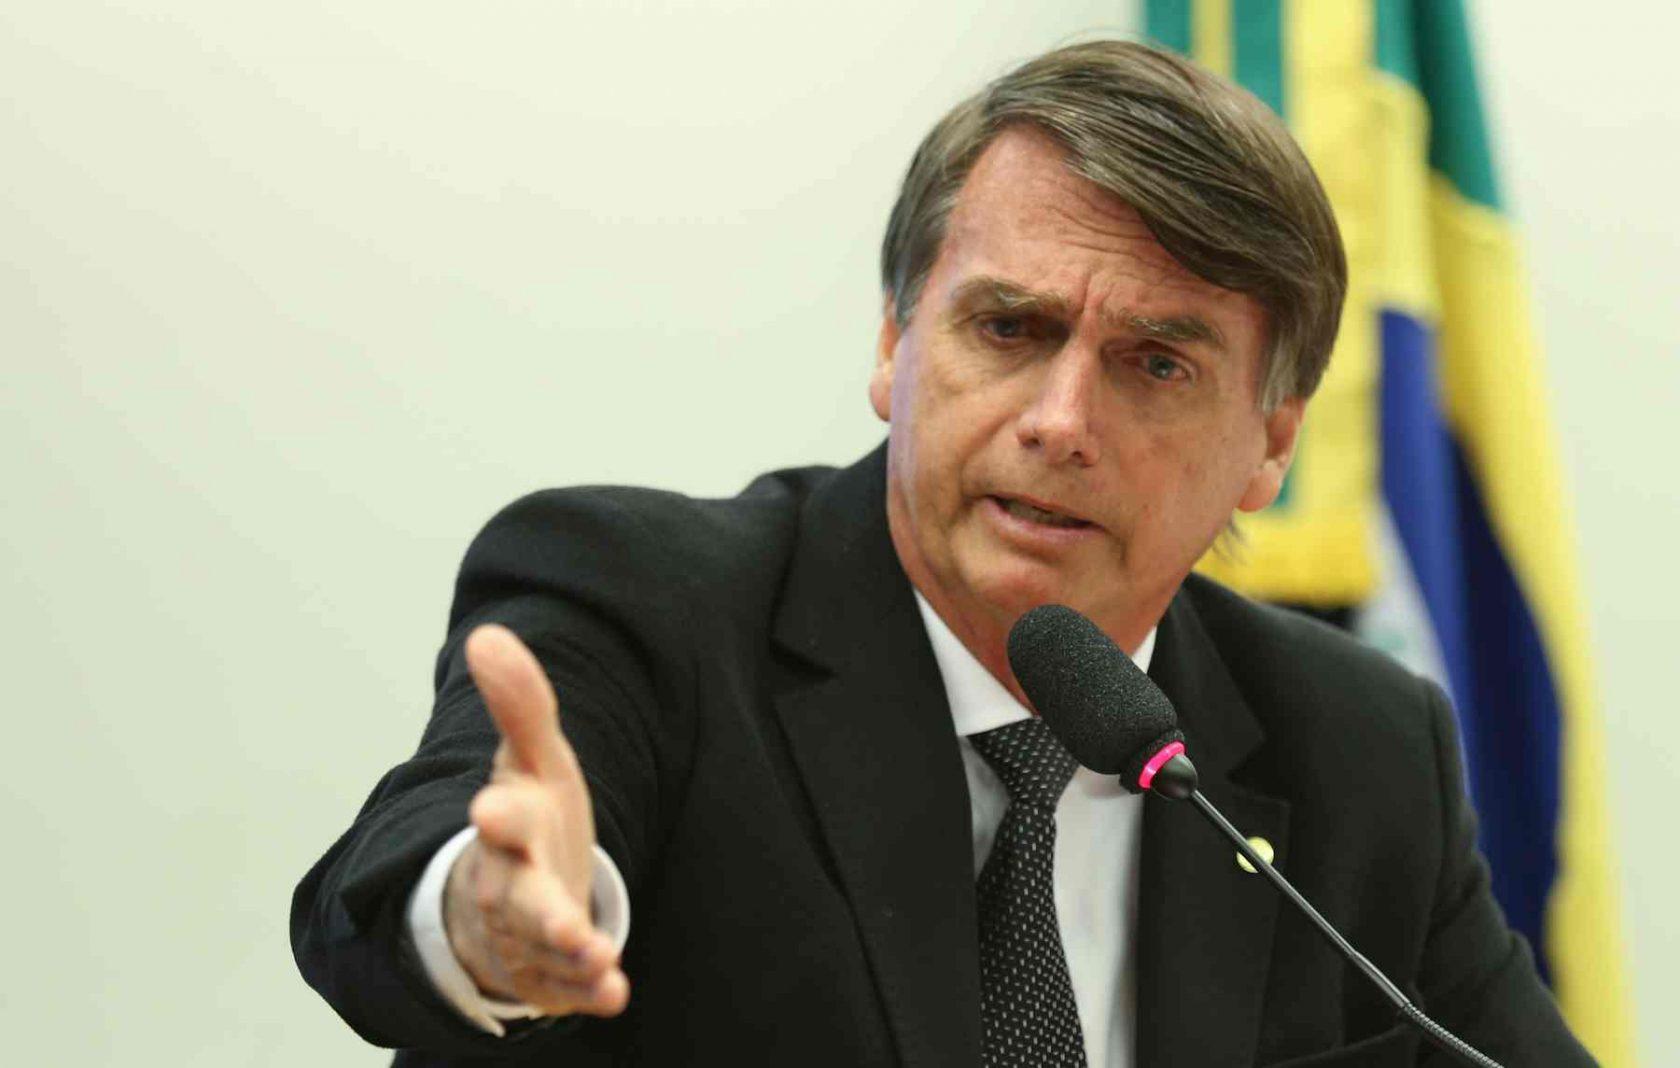 Brasile, bomba sanitaria che il mondo sottovaluta